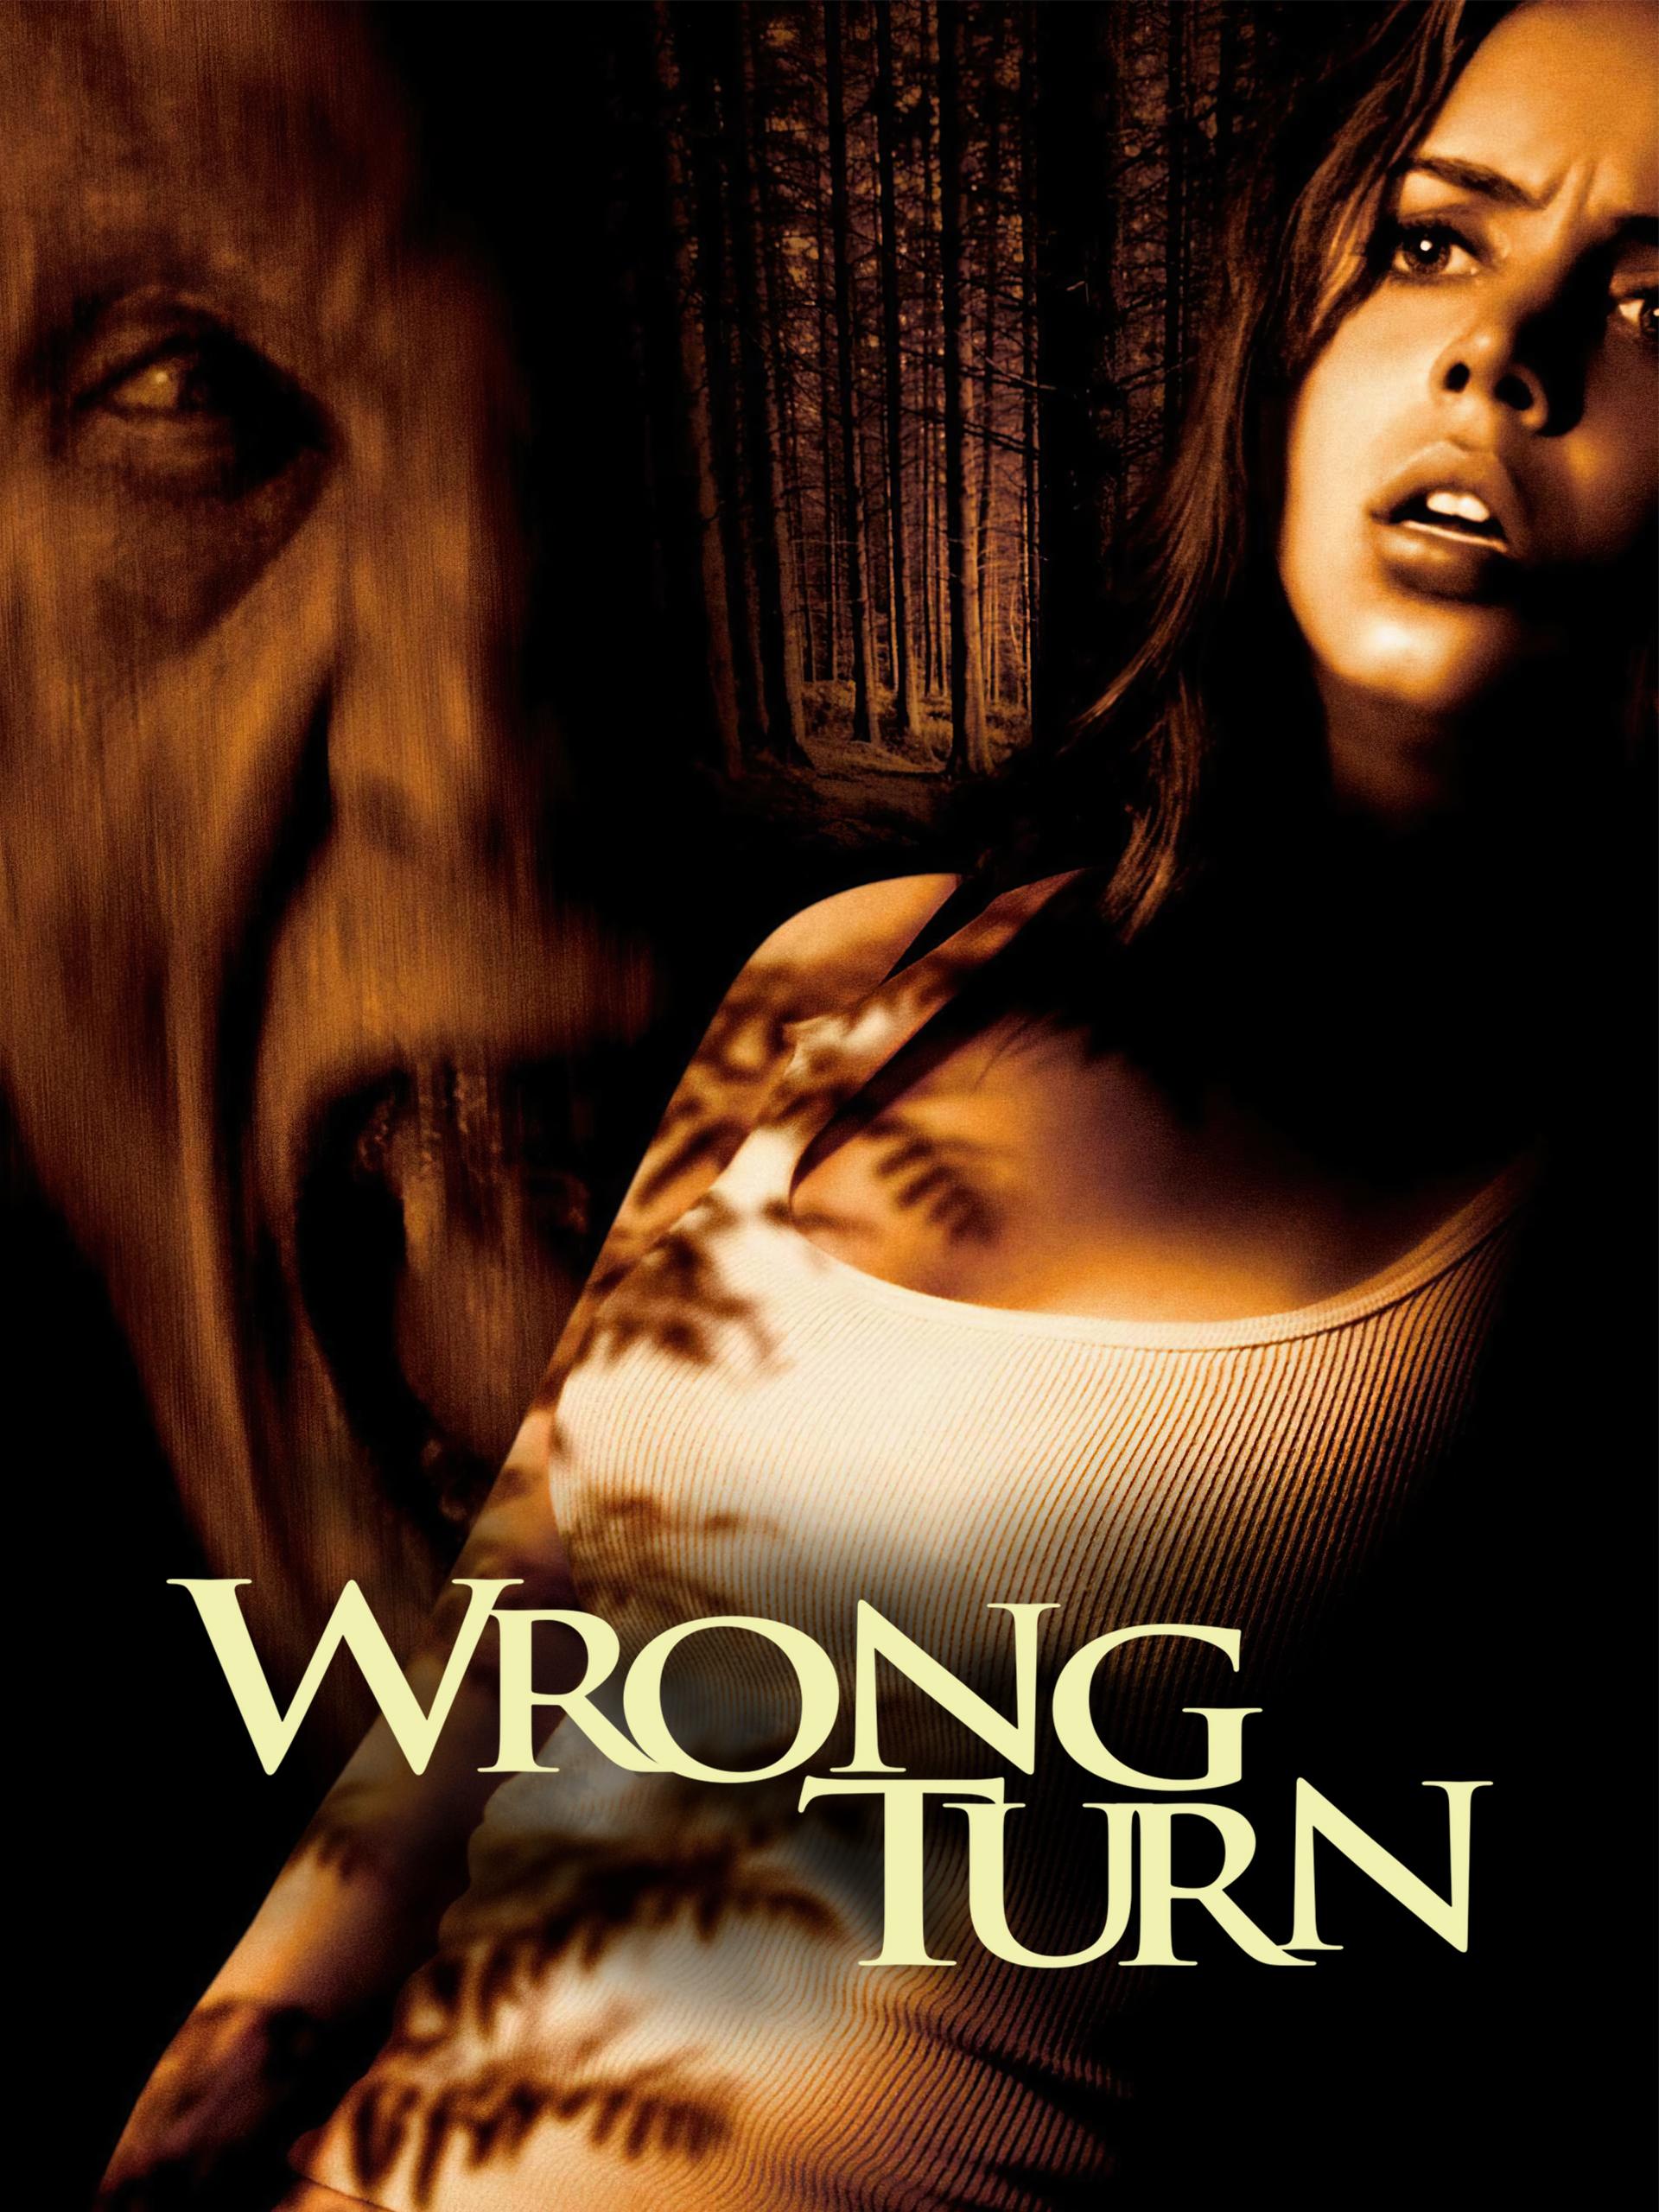 Wrong Turn (2003) Dual Audio Hindi ORG 350MB BluRay 480p ESubs Download